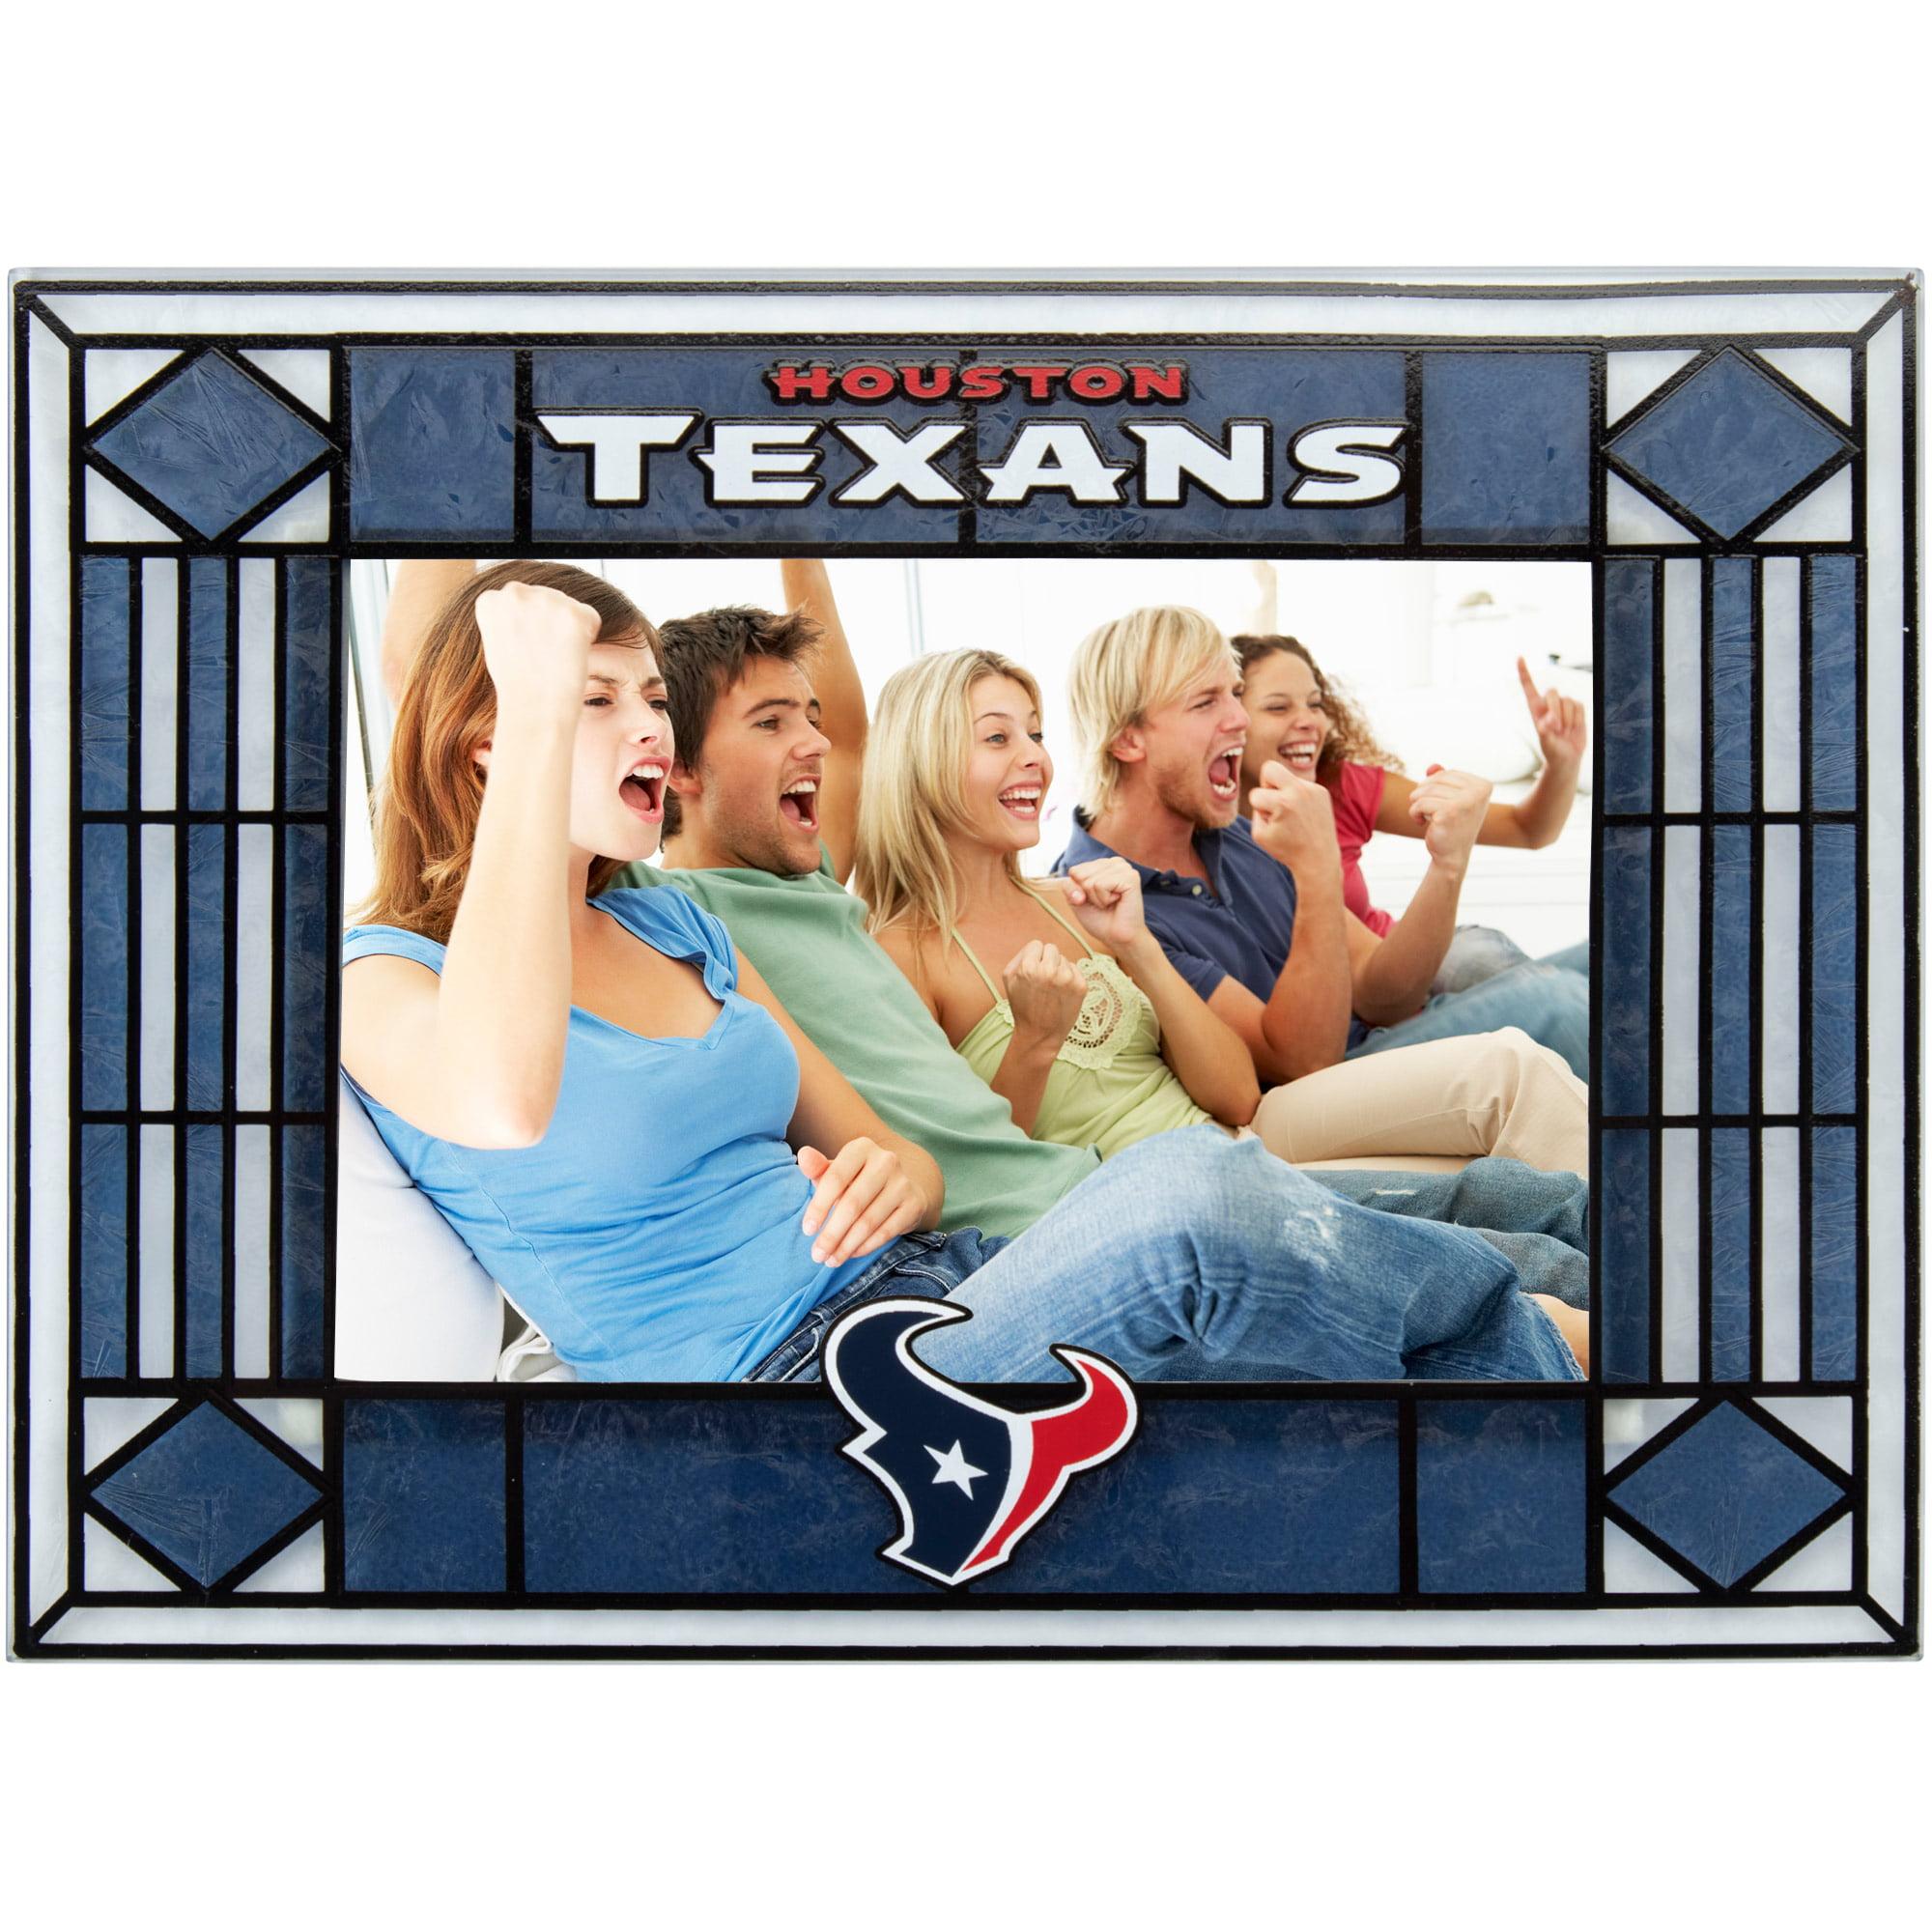 Houston Texans Art-Glass Horizontal Picture Frame - No Size